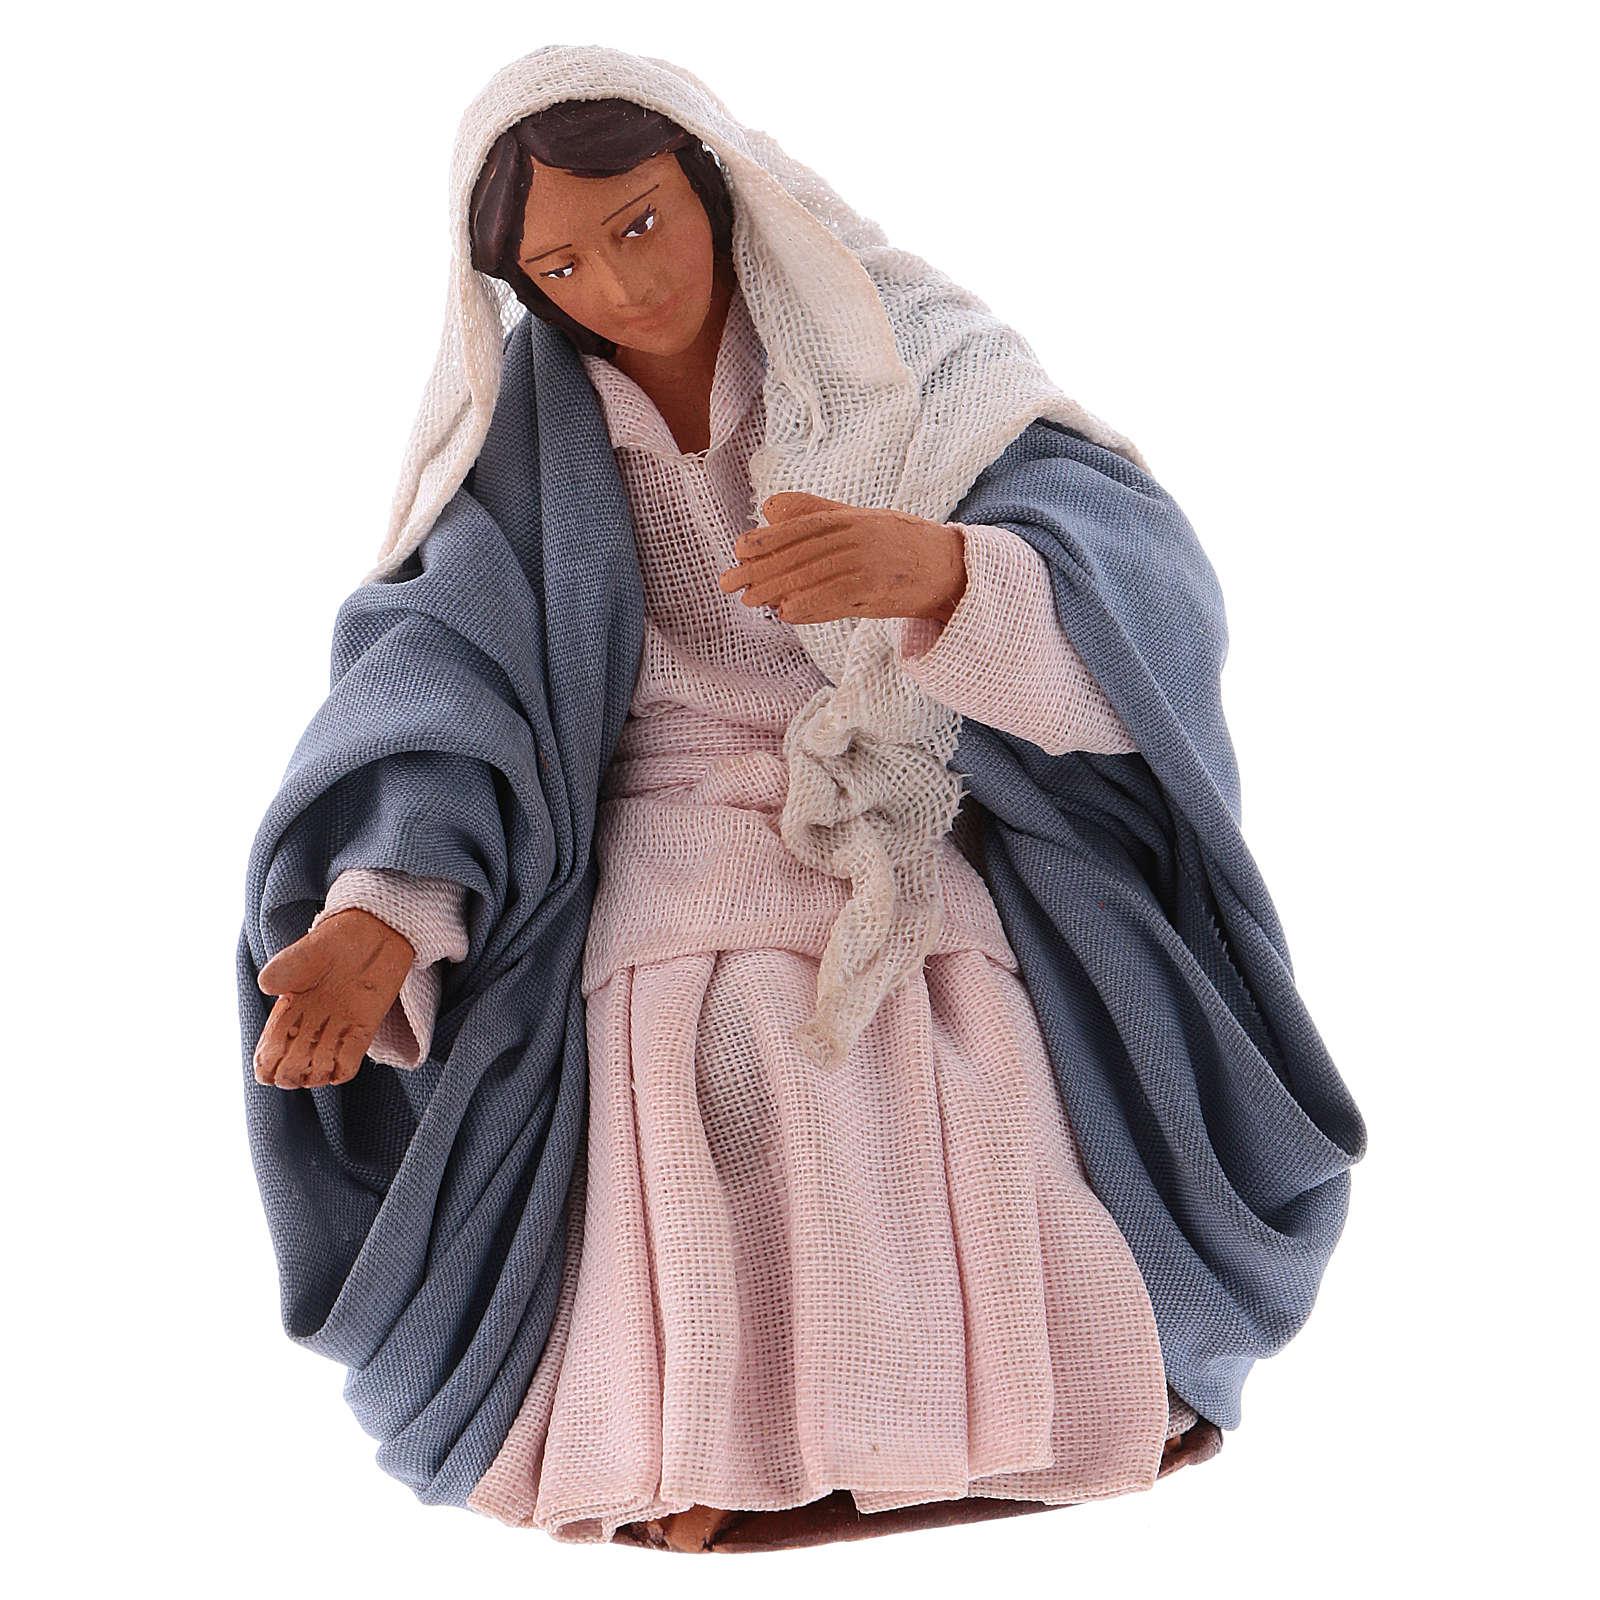 Virgin Mary 12 cm Neapolitan Nativity, terracotta 4